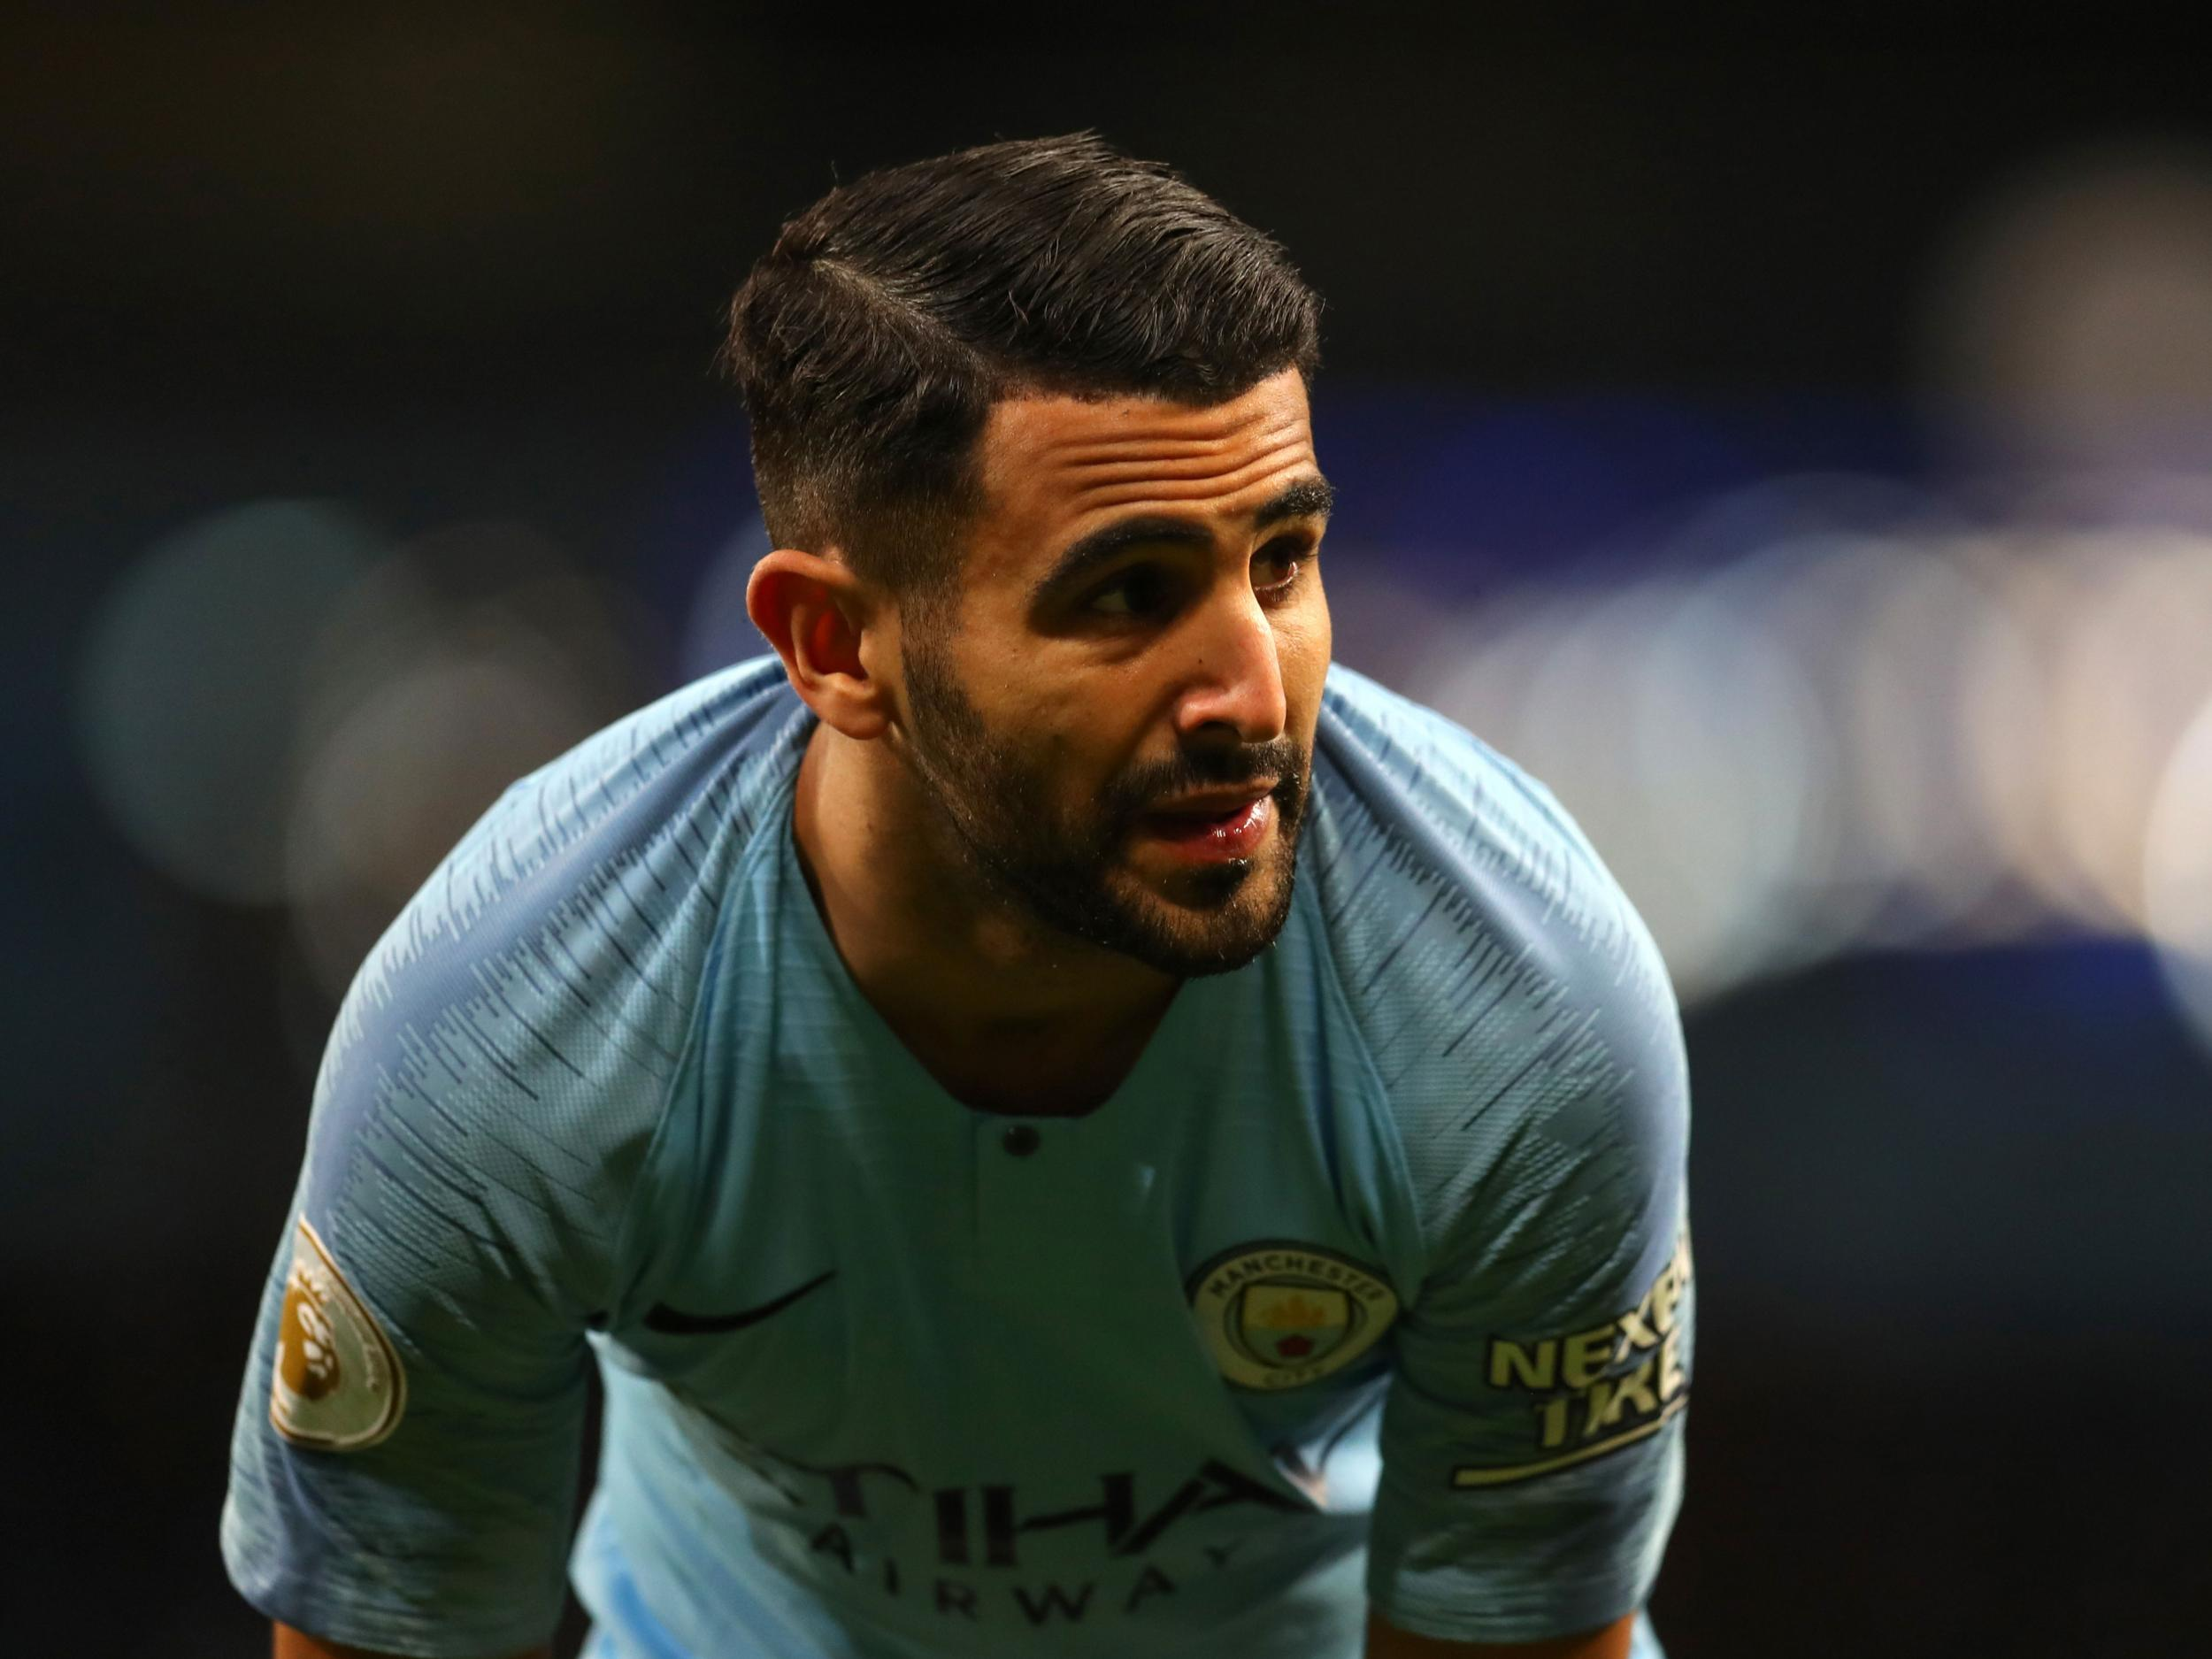 Manchester City news: Pep Guardiola reveals why Riyad Mahrez hasn't been playing